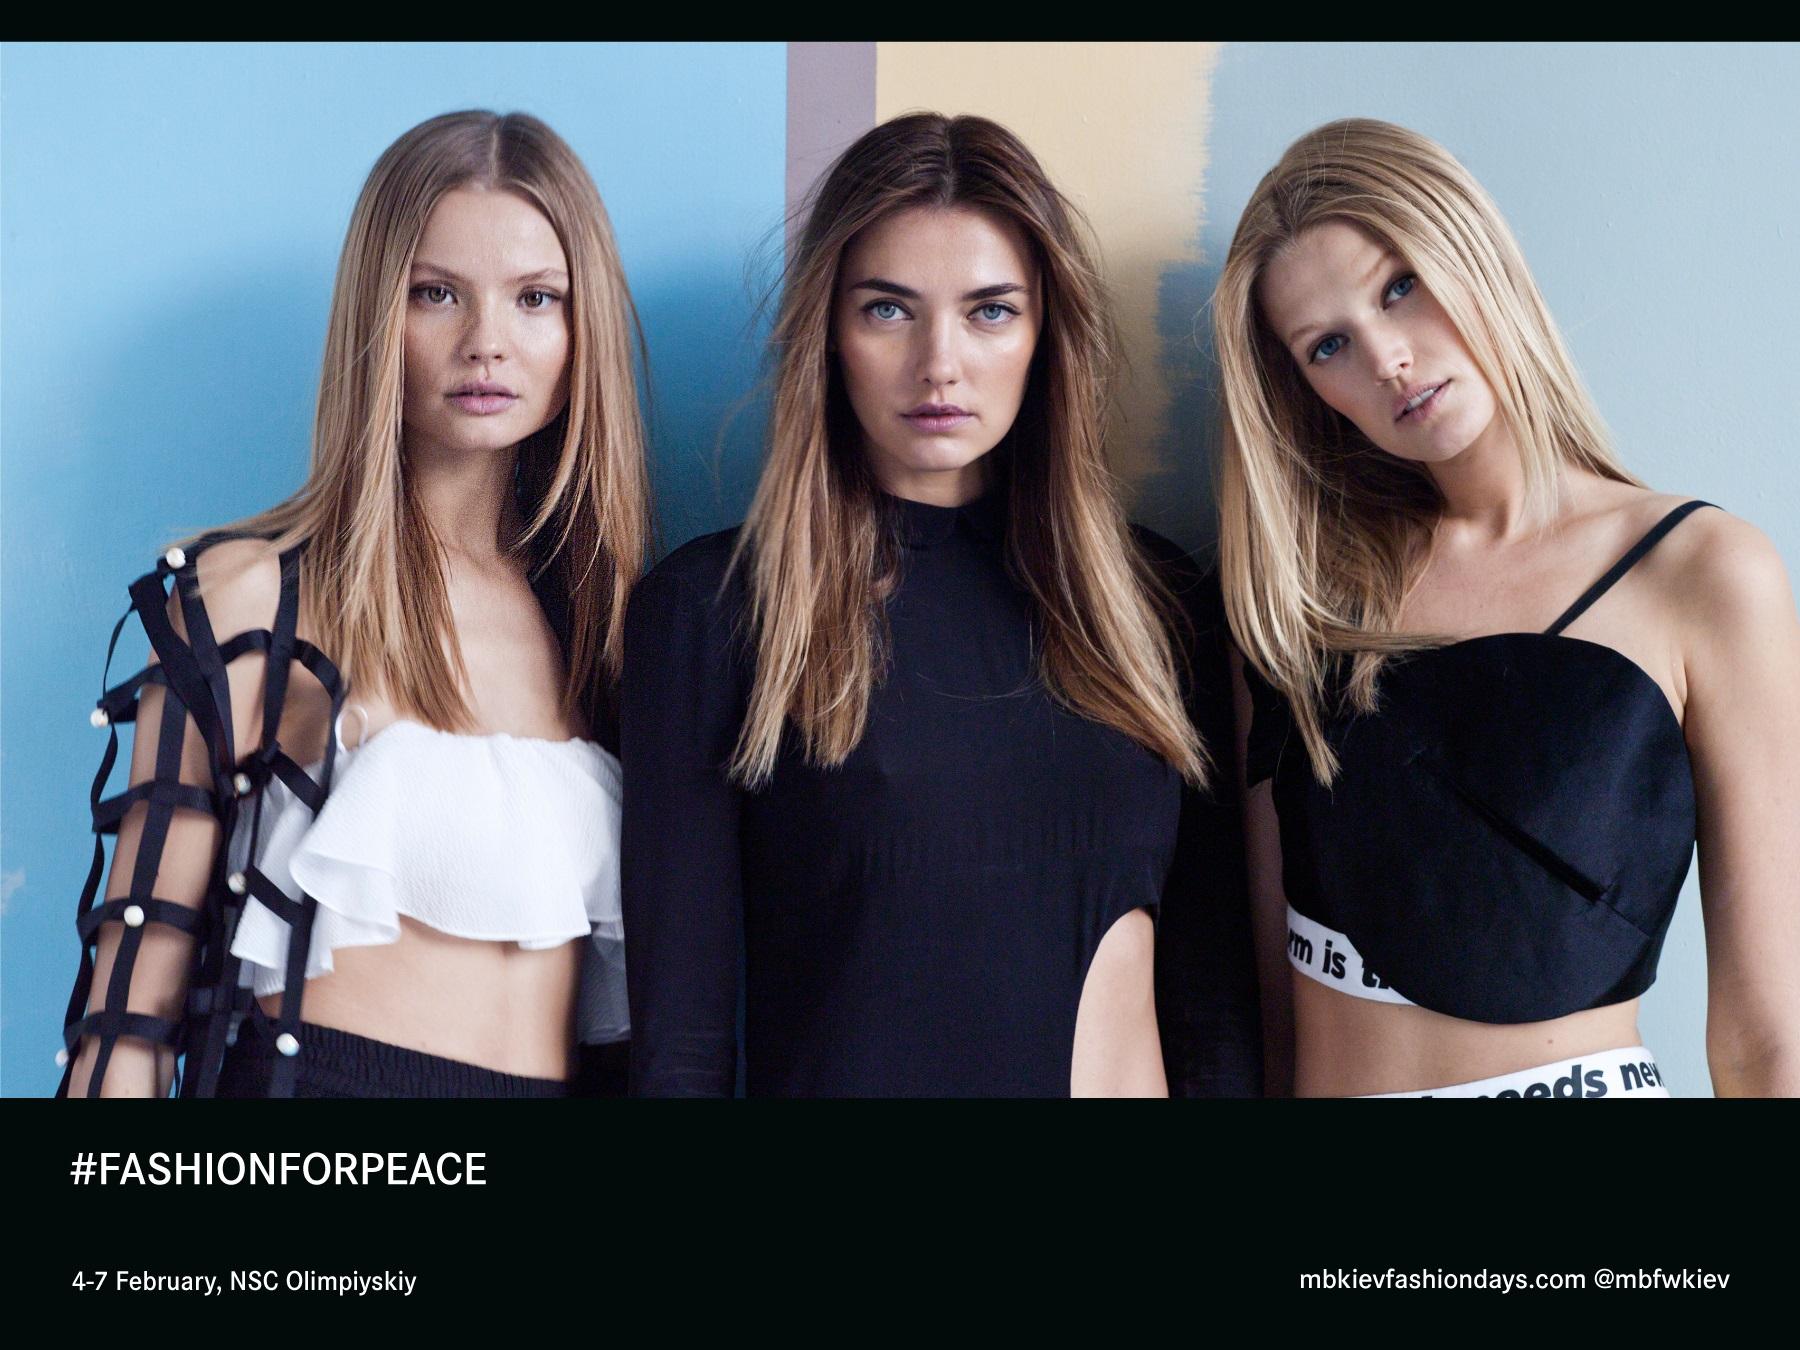 Афиша мероприятий на 6-7 февраля Mercedes-Benz Kiev Fashion Days